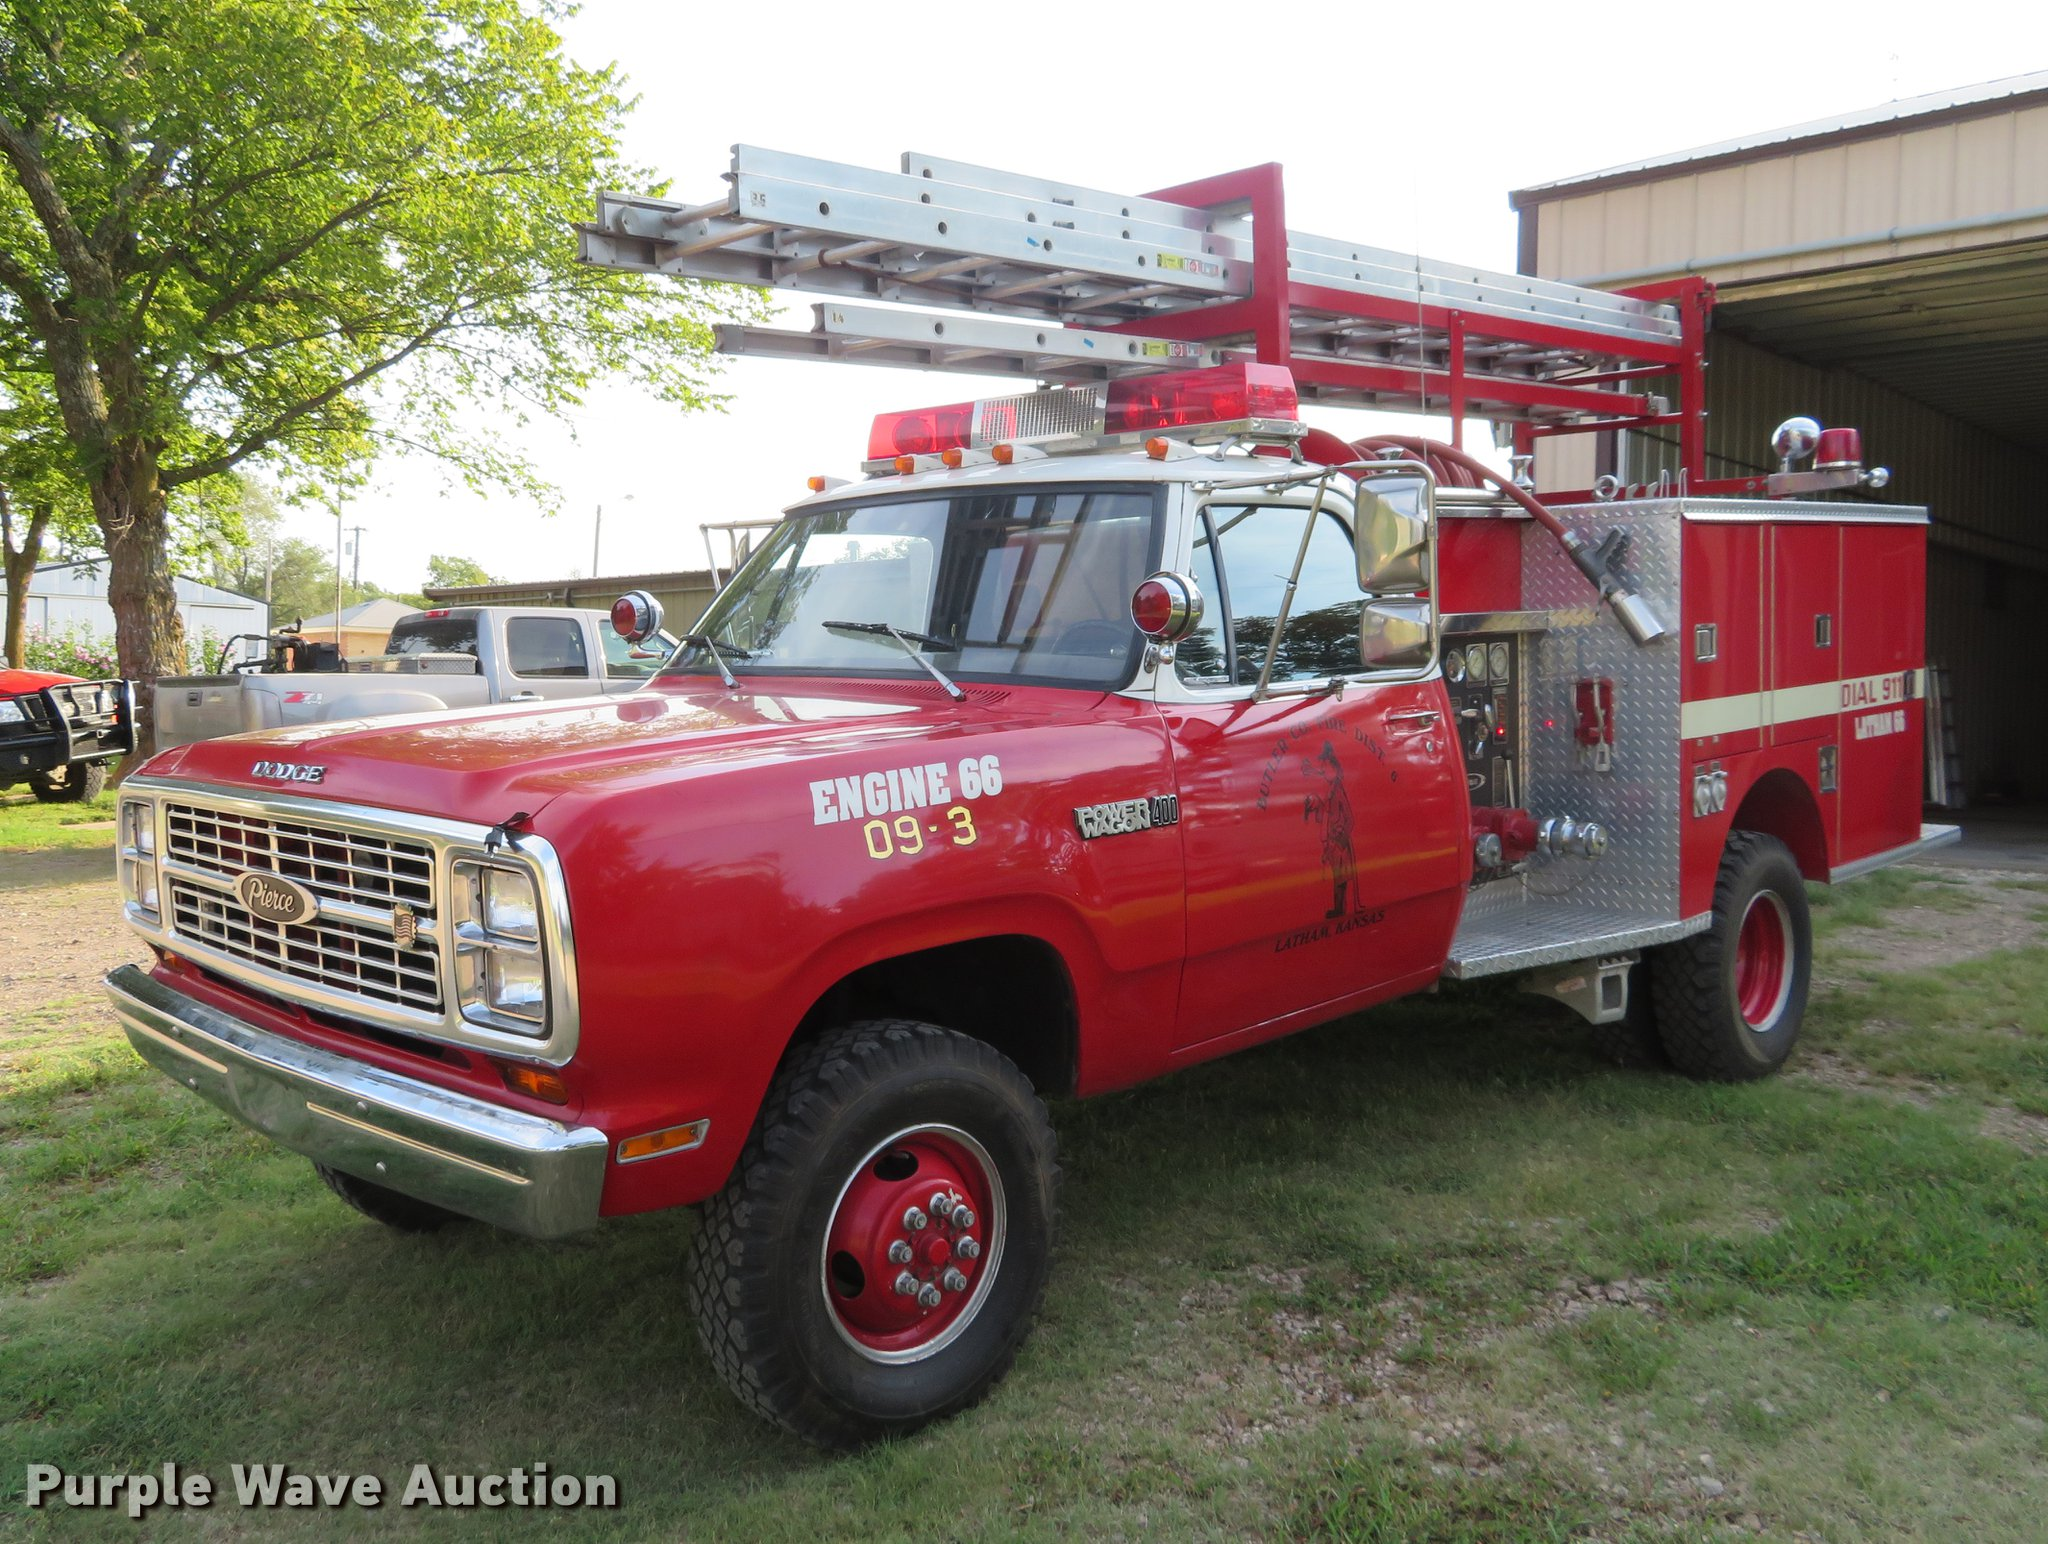 1980 Dodge Ram Power Wagon 400 Pierce Mini Pumper Fire Truck Full Size In New Window